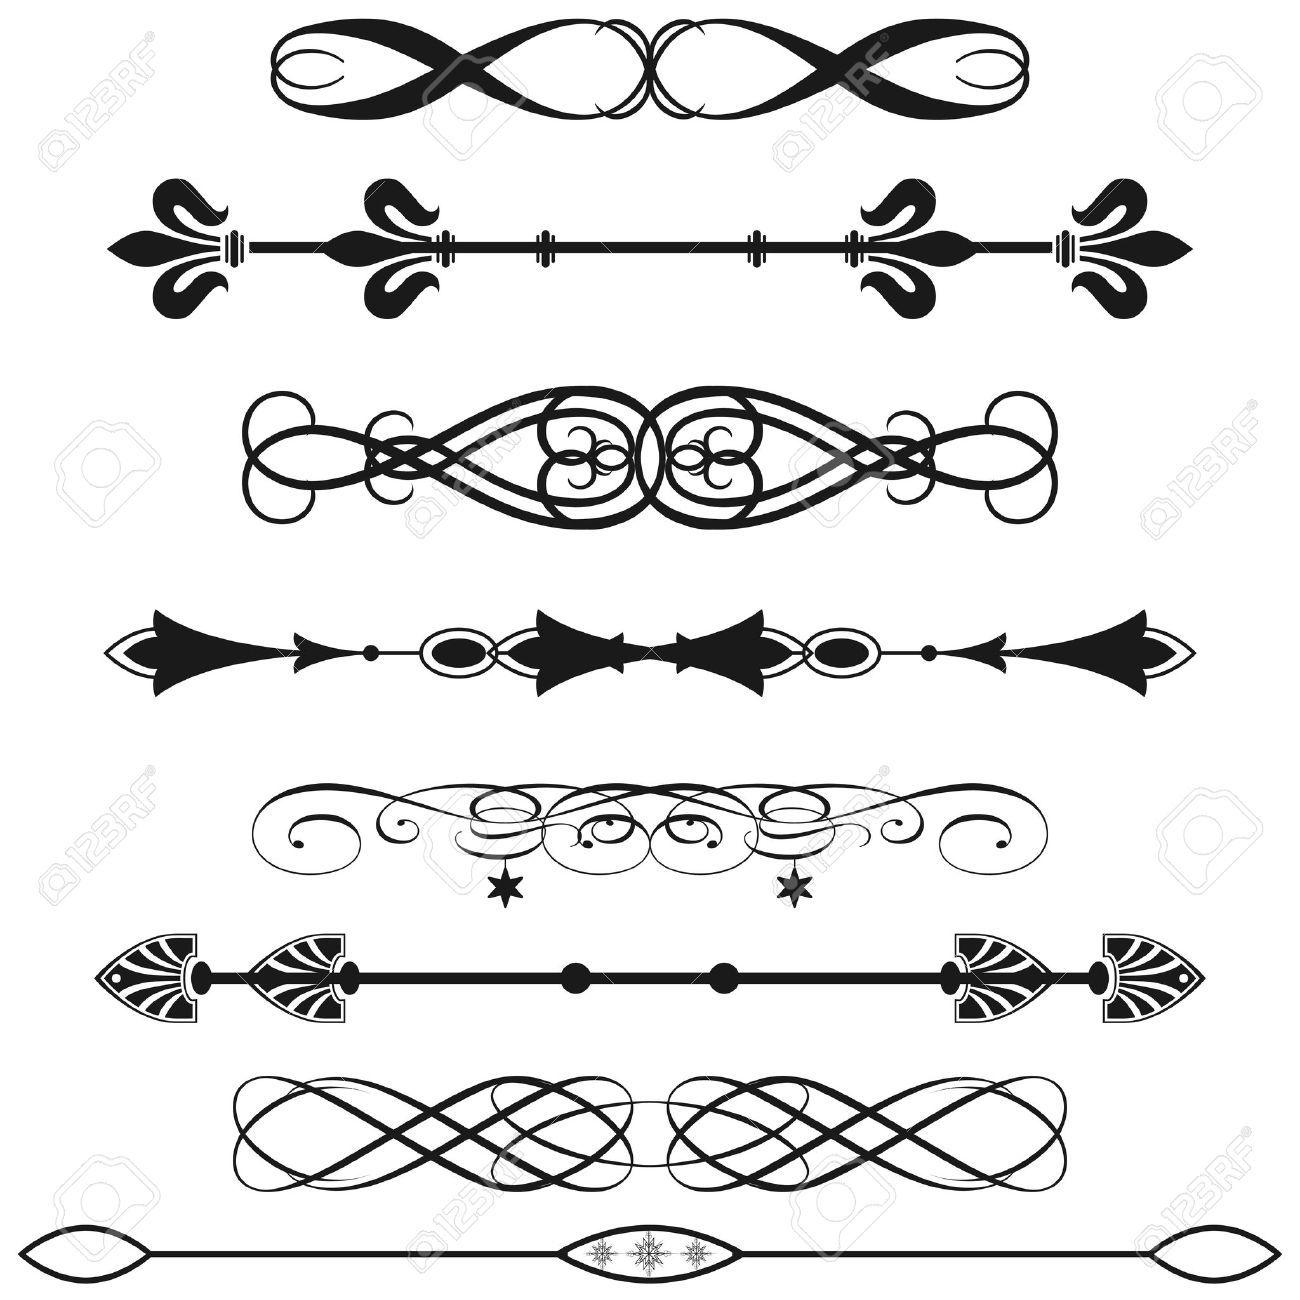 Line Art Vector Design : Horizontal line designs google search cricut